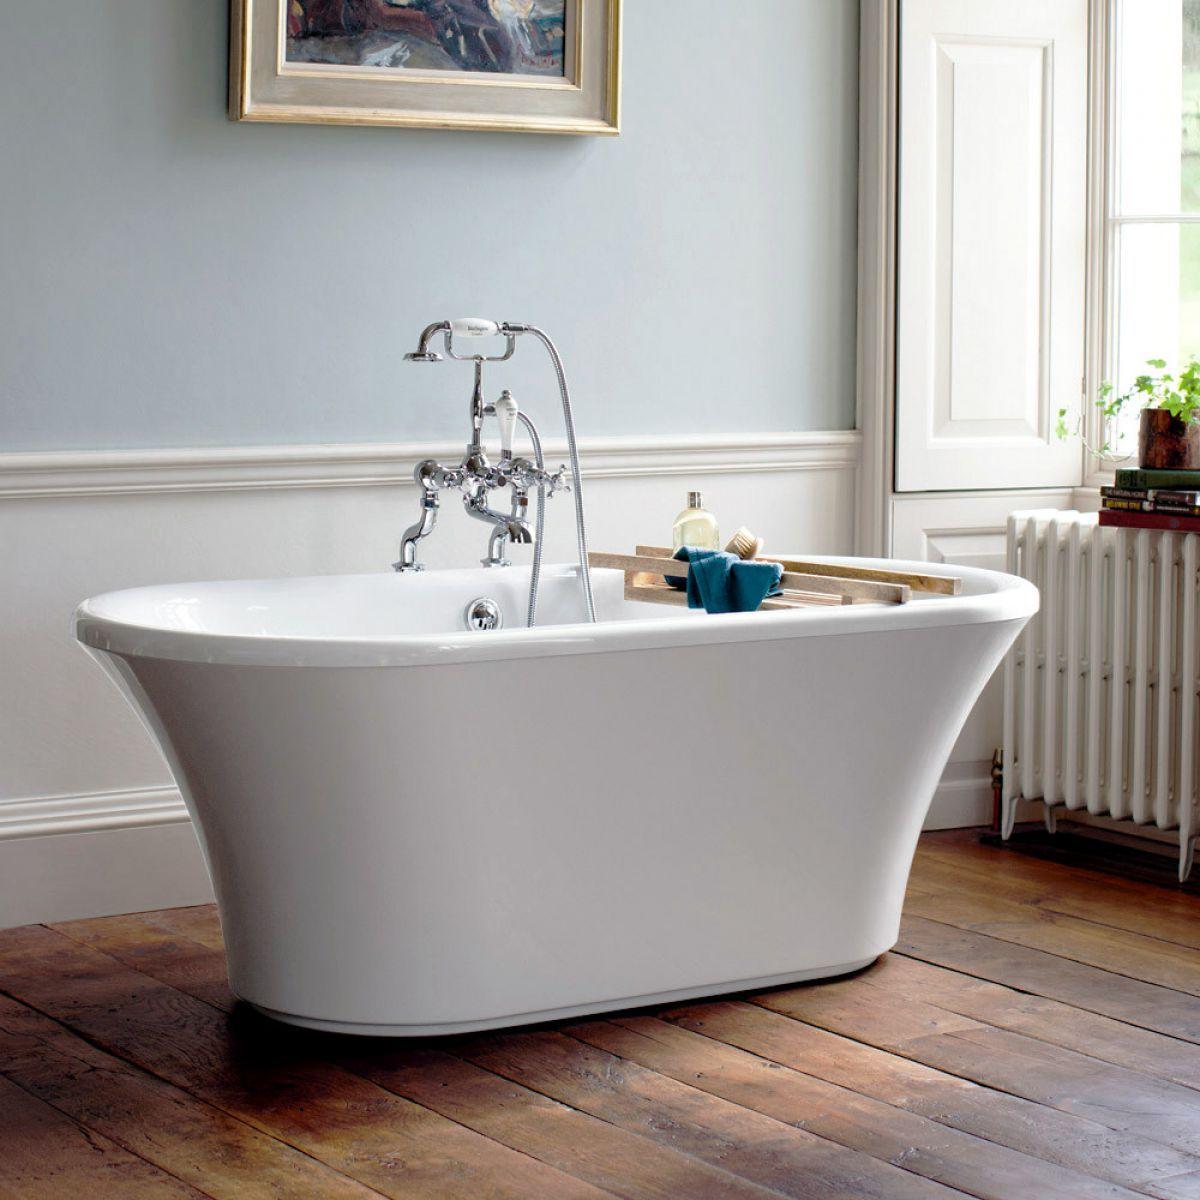 Bathroom Burlington Ideas burlington brindley double ended soaking tub   bathroom